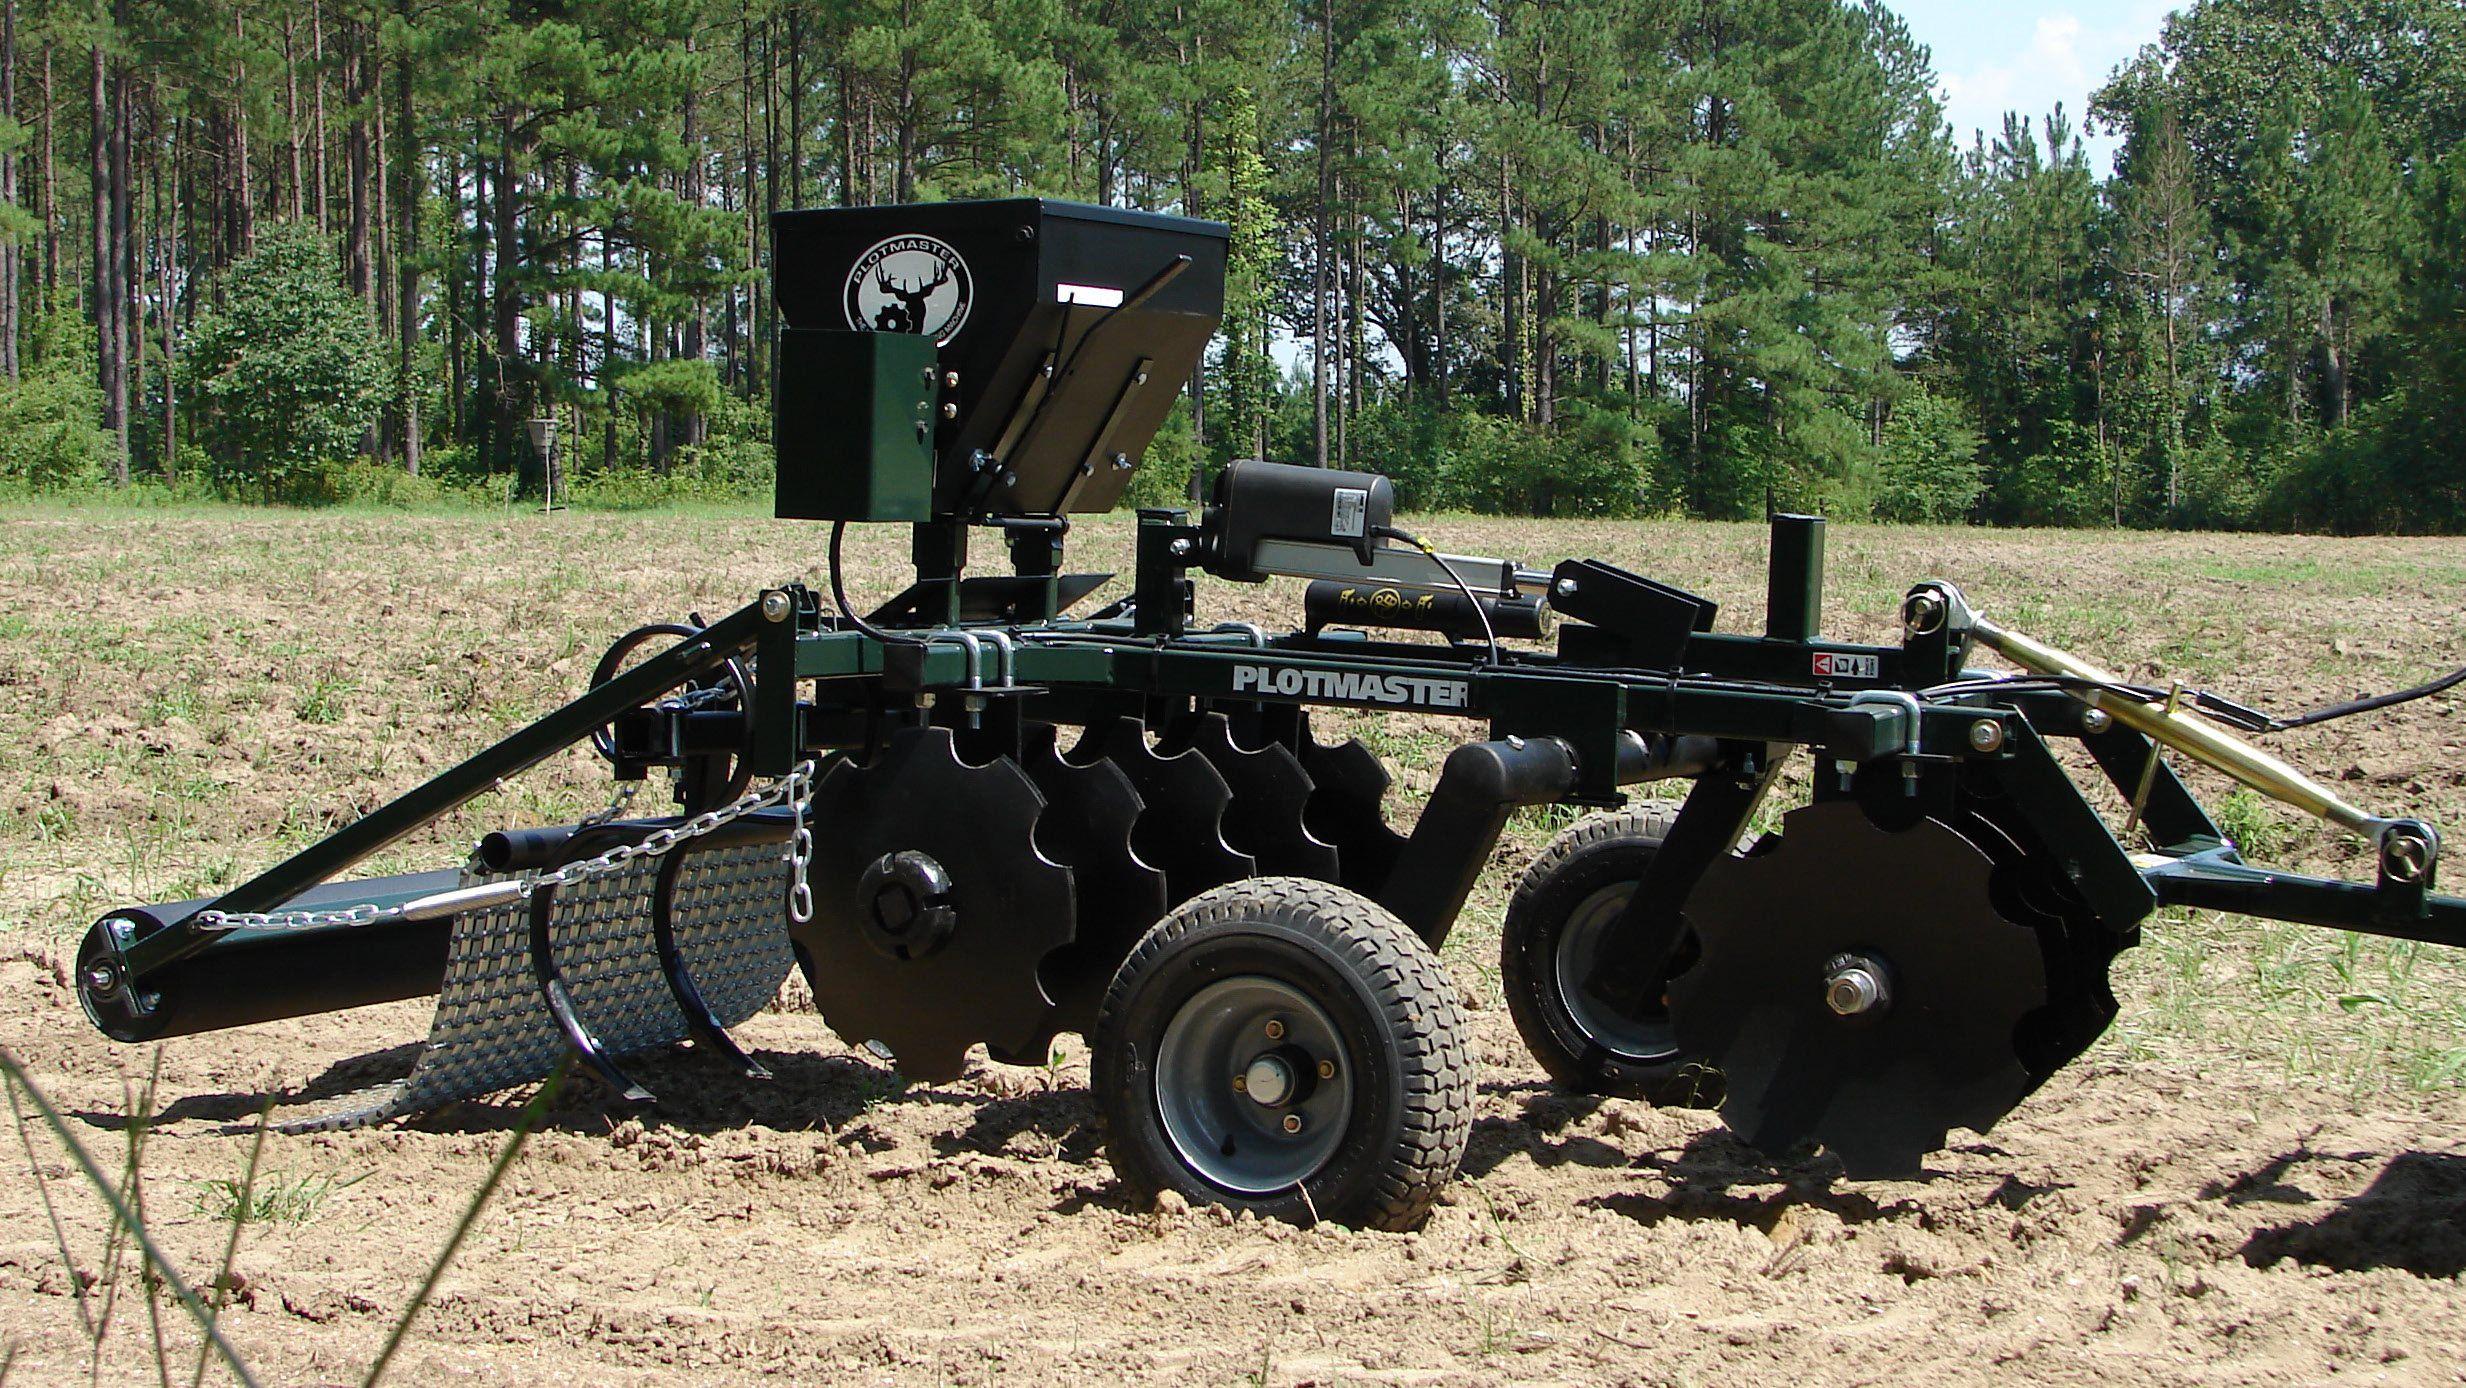 Hunter 300 - Planting